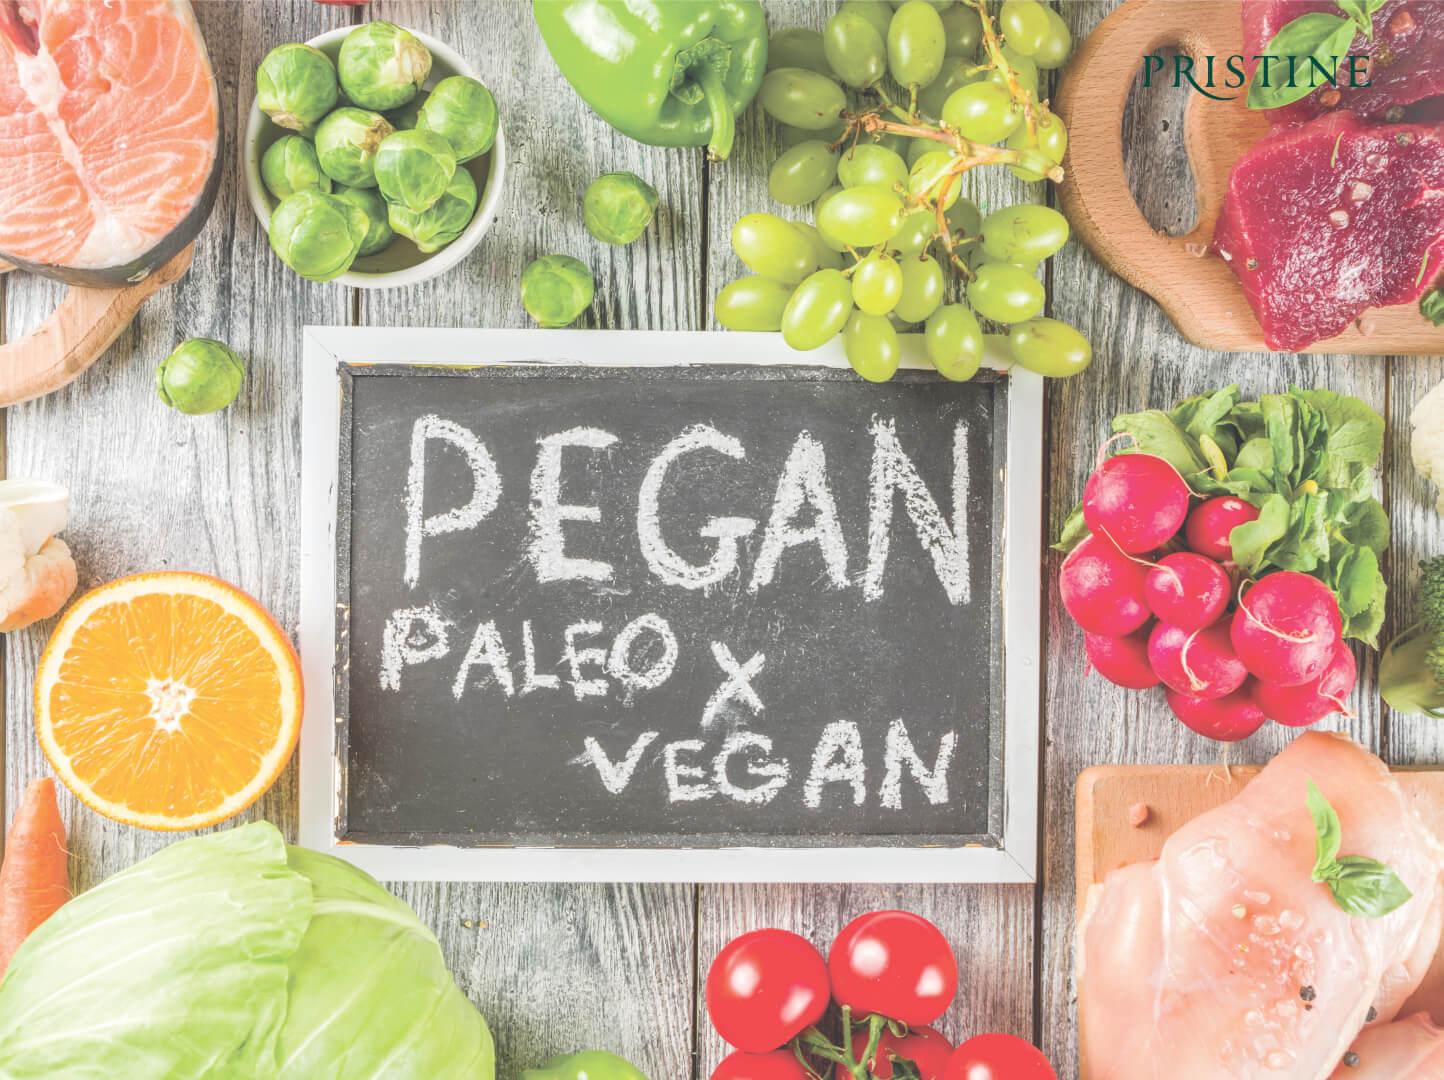 Pegan diet - vegan and paleo diet - pristine organics